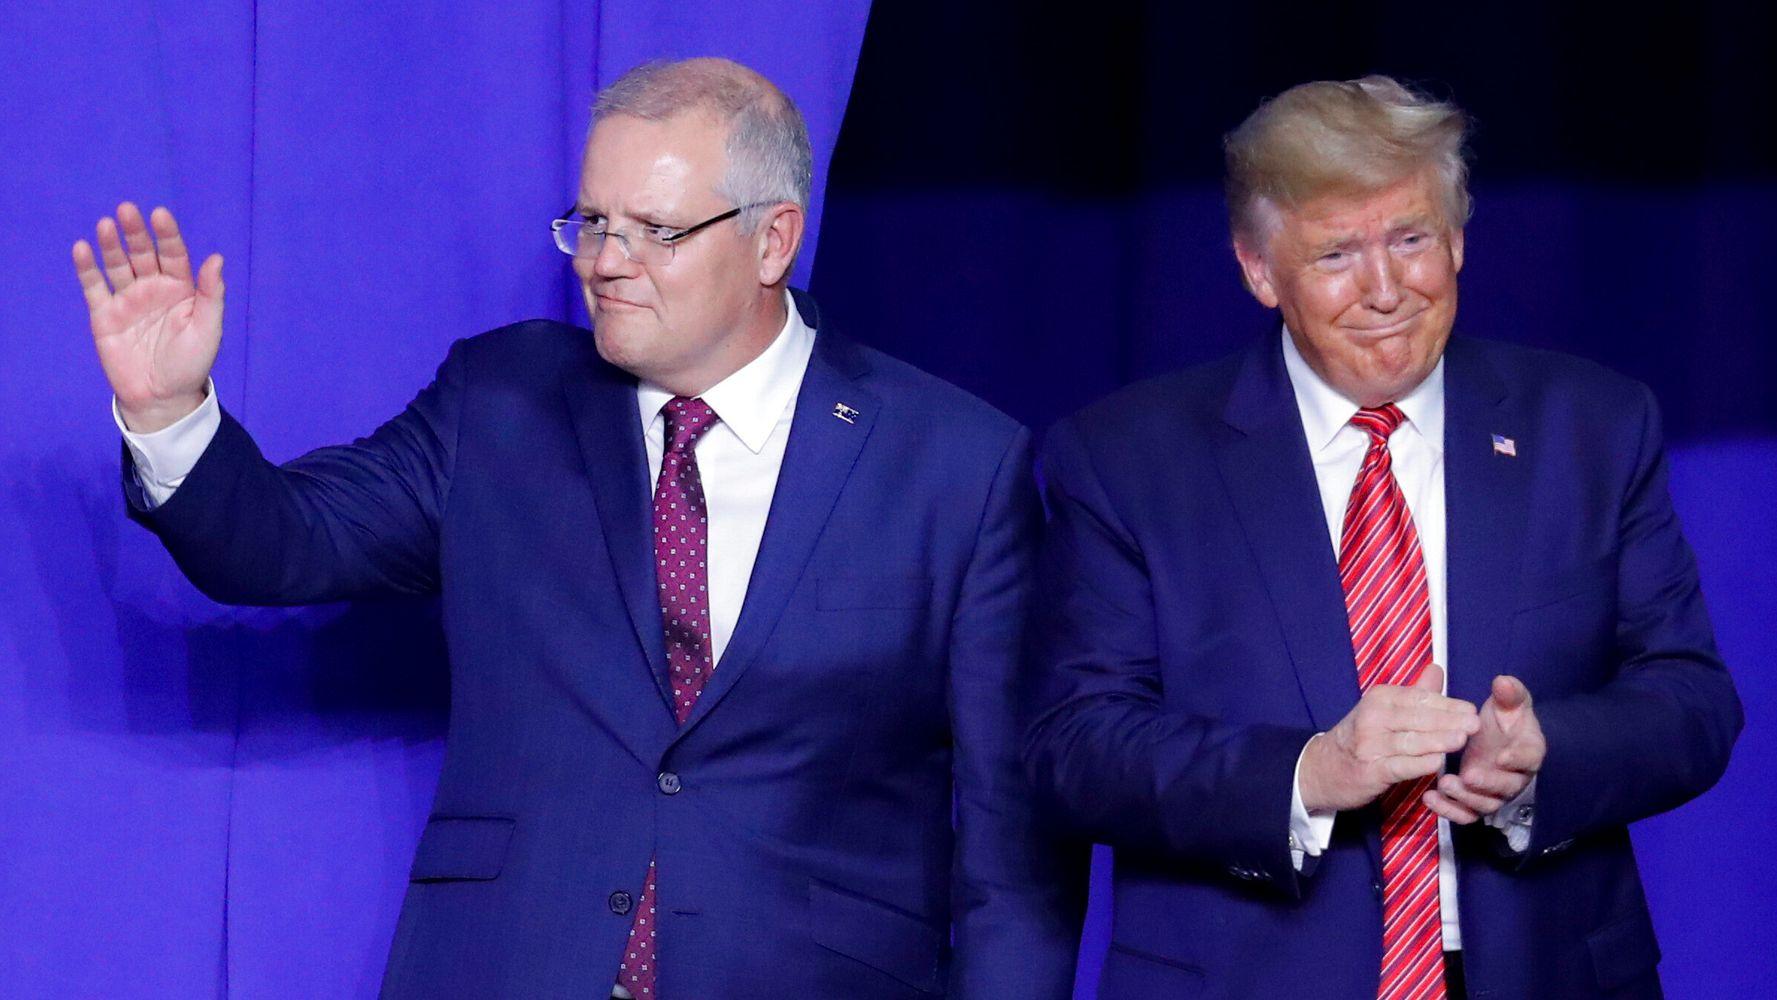 Westlake Legal Group 5d9265572100005b00fe589e Trump Reportedly Pressured Australian Leader To Assist DOJ In Investigating Mueller Probe